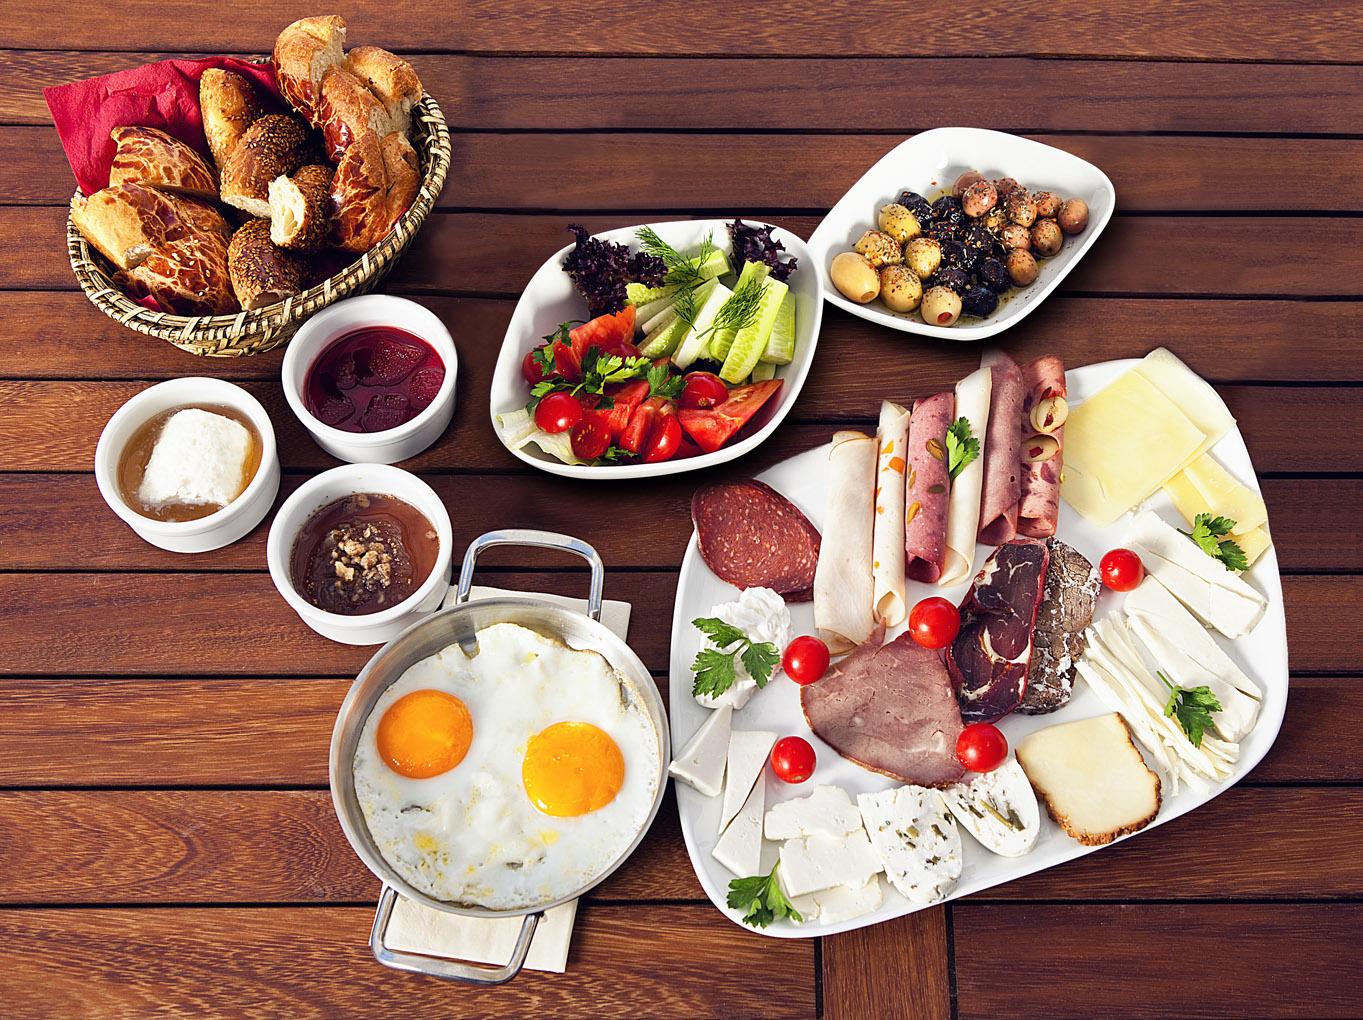 kahvalti-rahat-yedigin-ogun